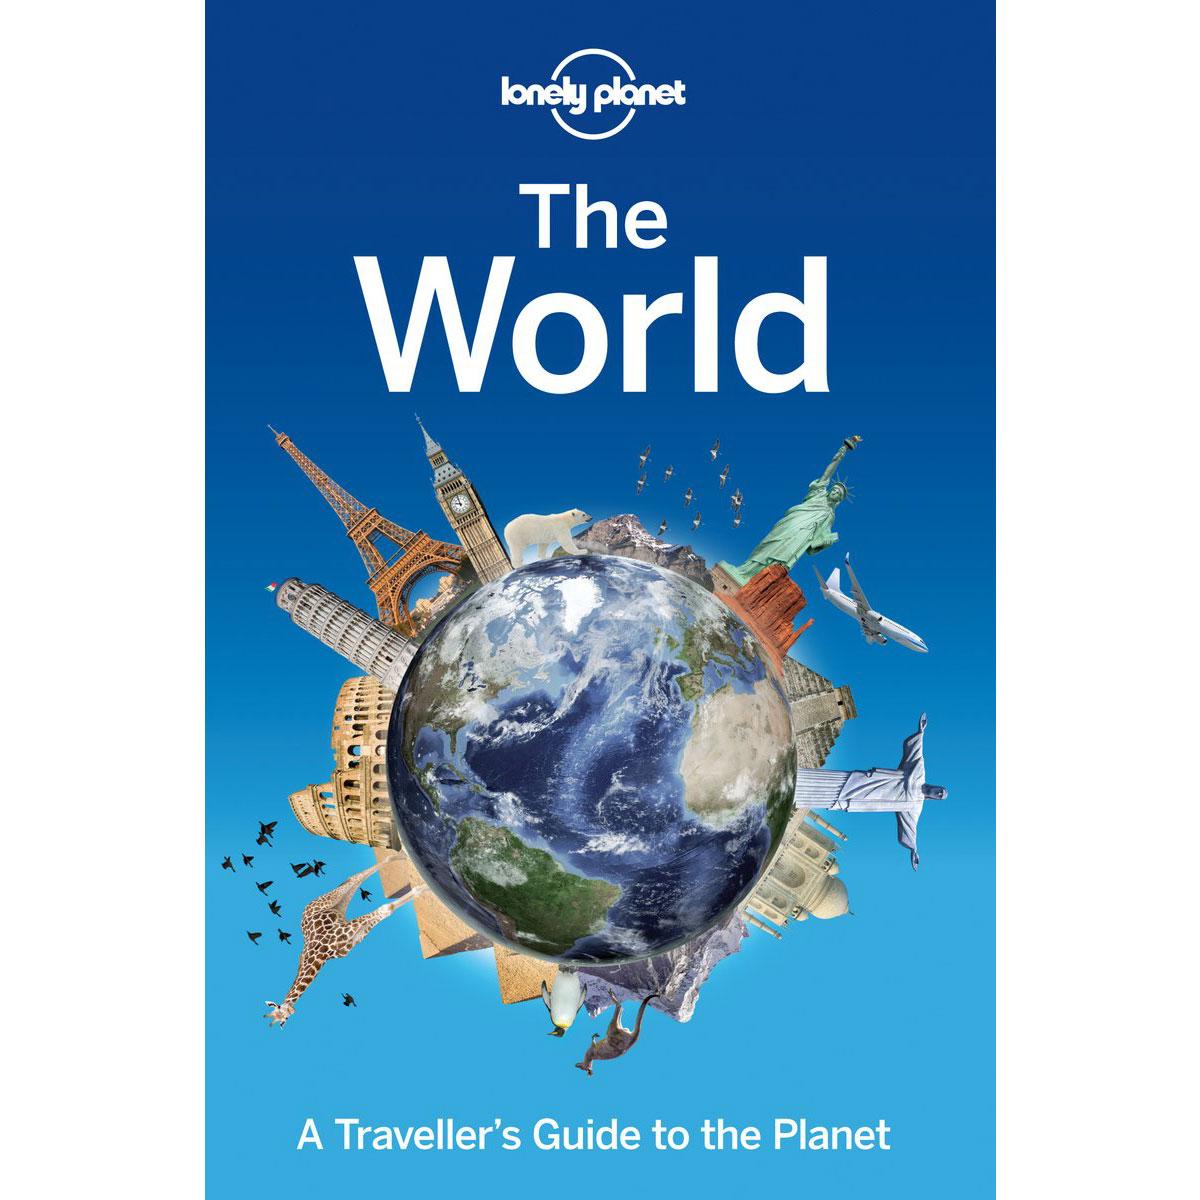 lonely planet ロンリープラネット(英語: lonely planet )とは、同名のタイトルシリーズを持つ旅行ガイドブック、およびその出版元である.